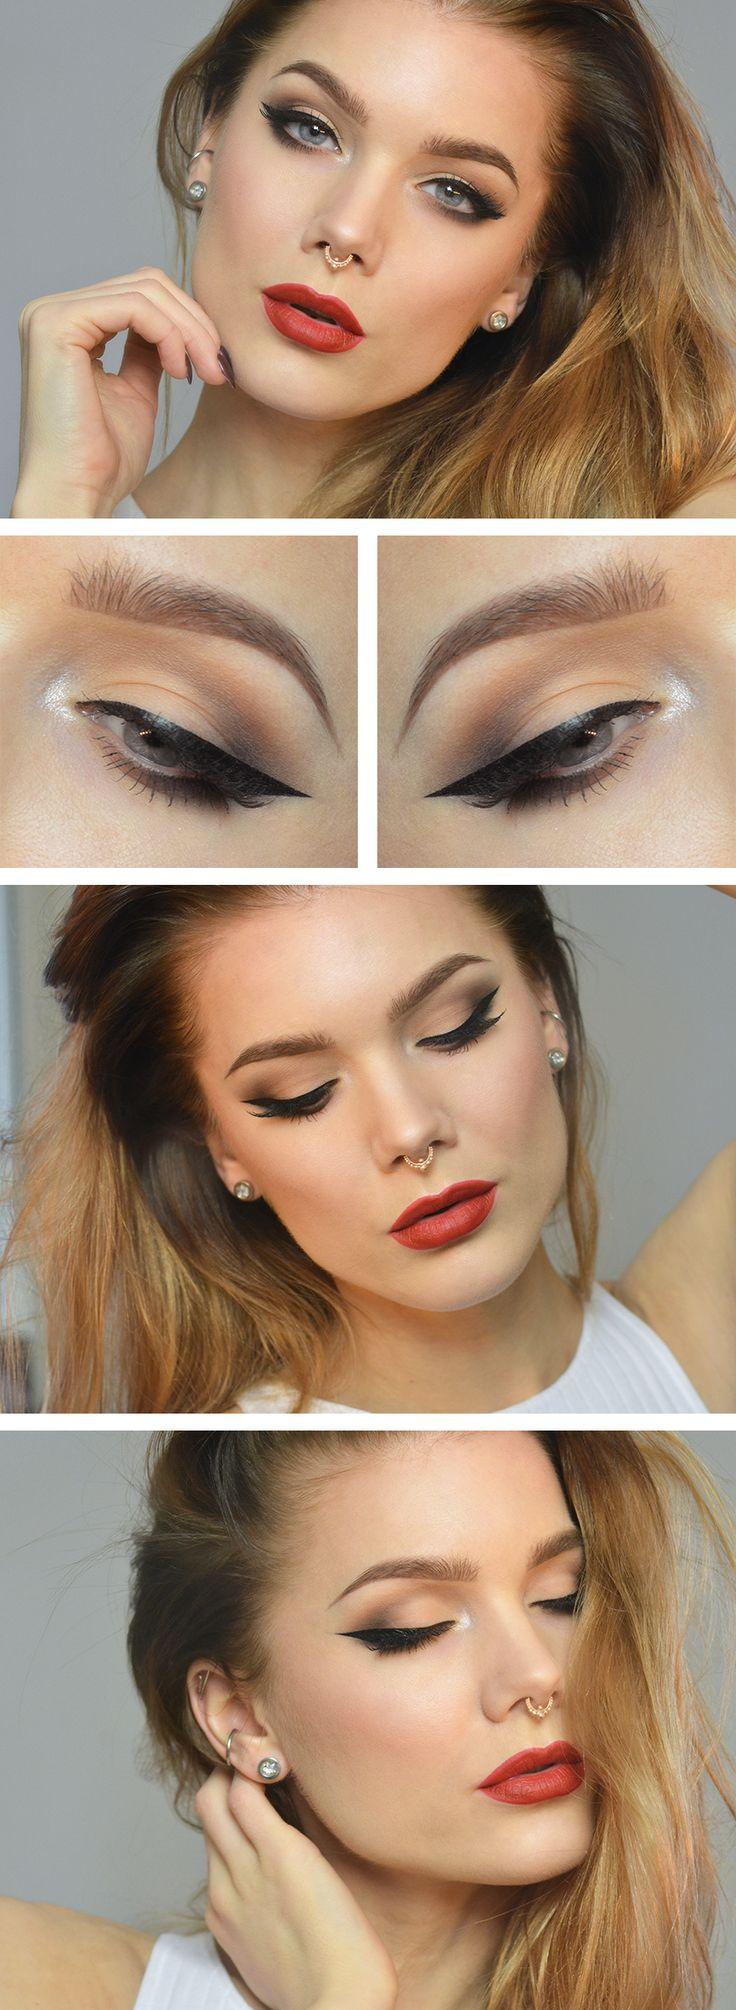 best makeup images on pinterest beauty makeup makeup ideas and